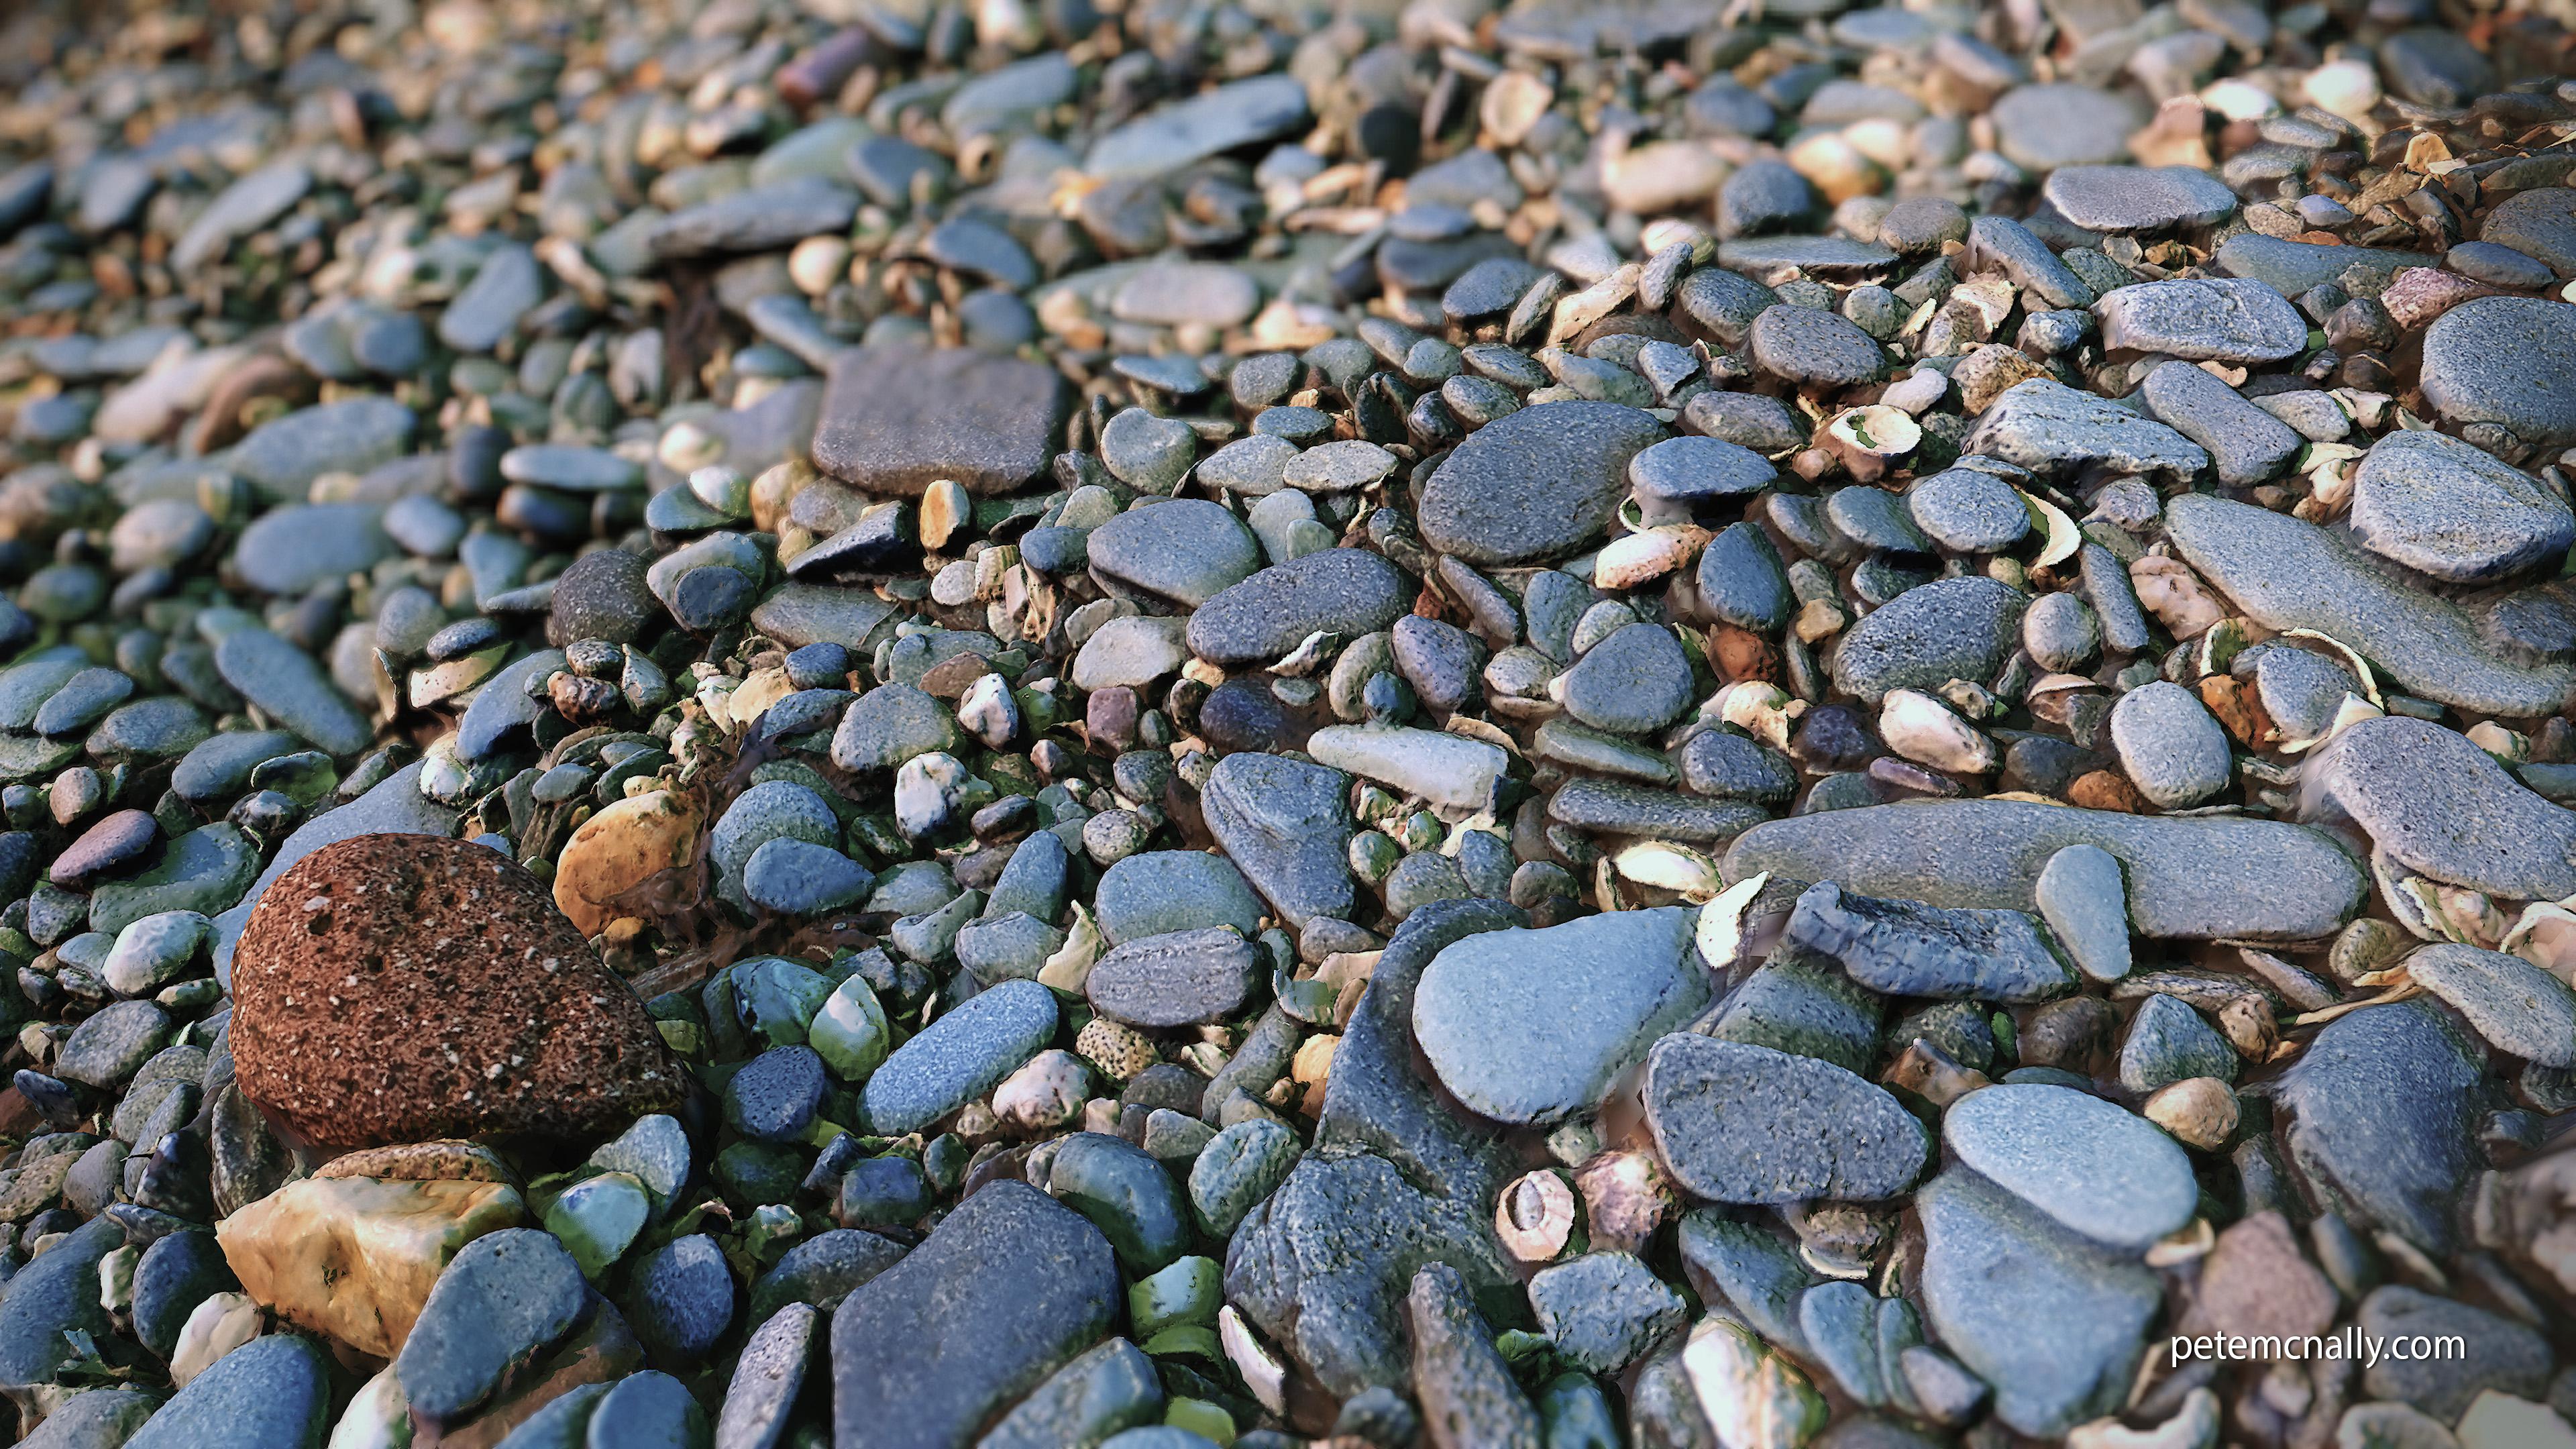 pebblesmaterial_petemcnally_05